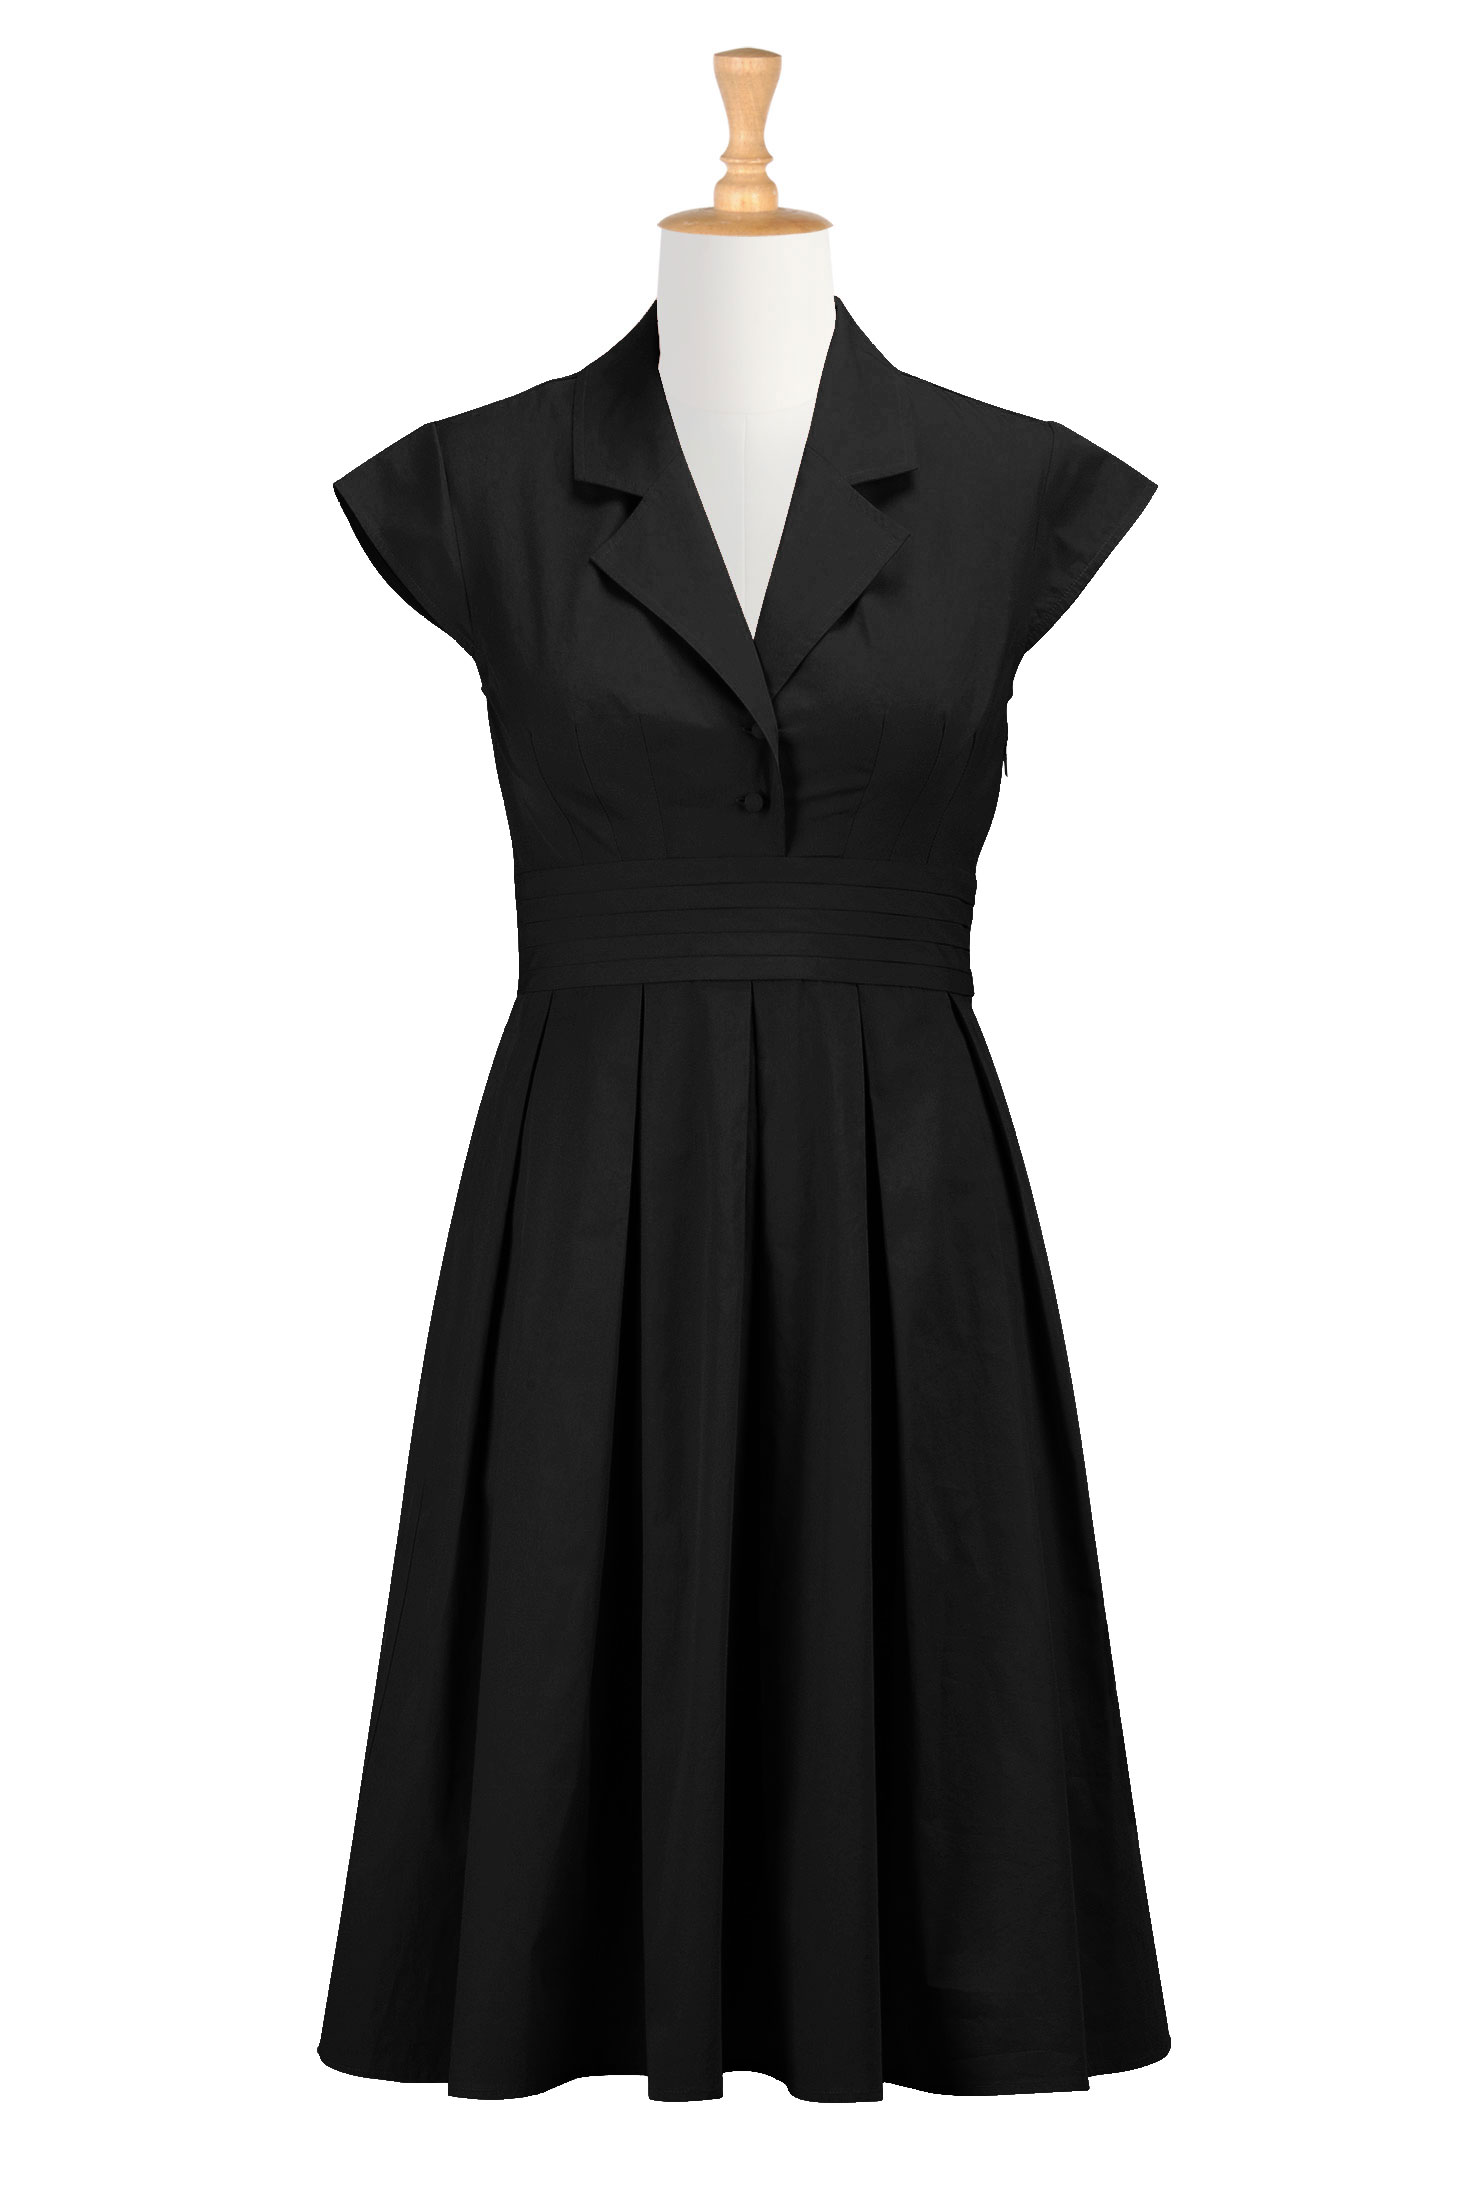 854e72e5fd 572879736435320130818 140329 black poplin dress